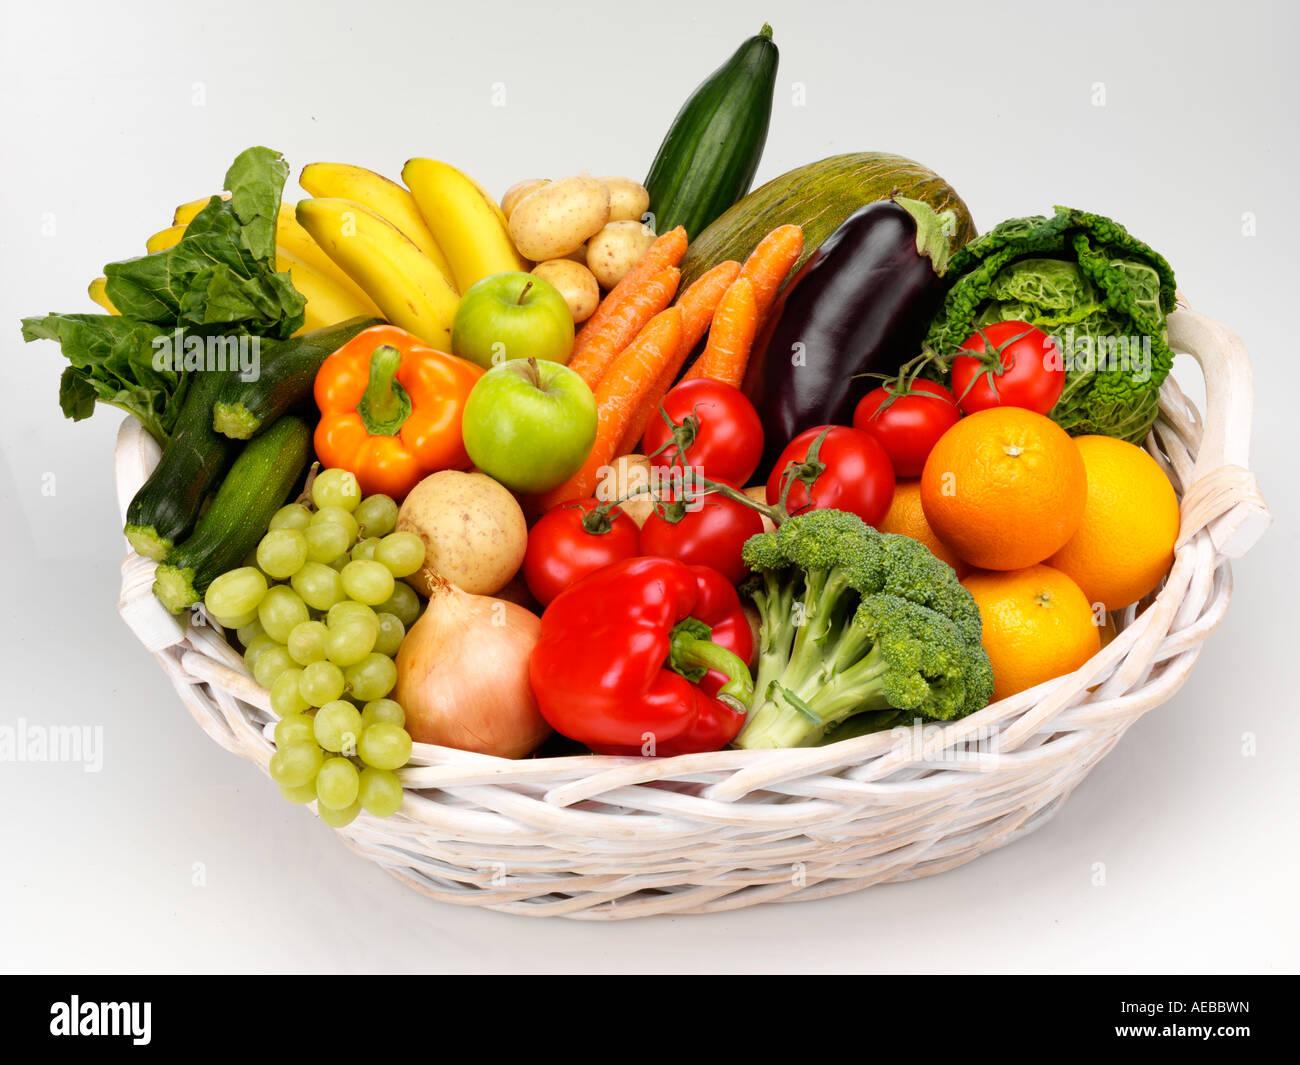 basket of fresh fruit and vegetables cut out stock photo 13629920 alamy. Black Bedroom Furniture Sets. Home Design Ideas